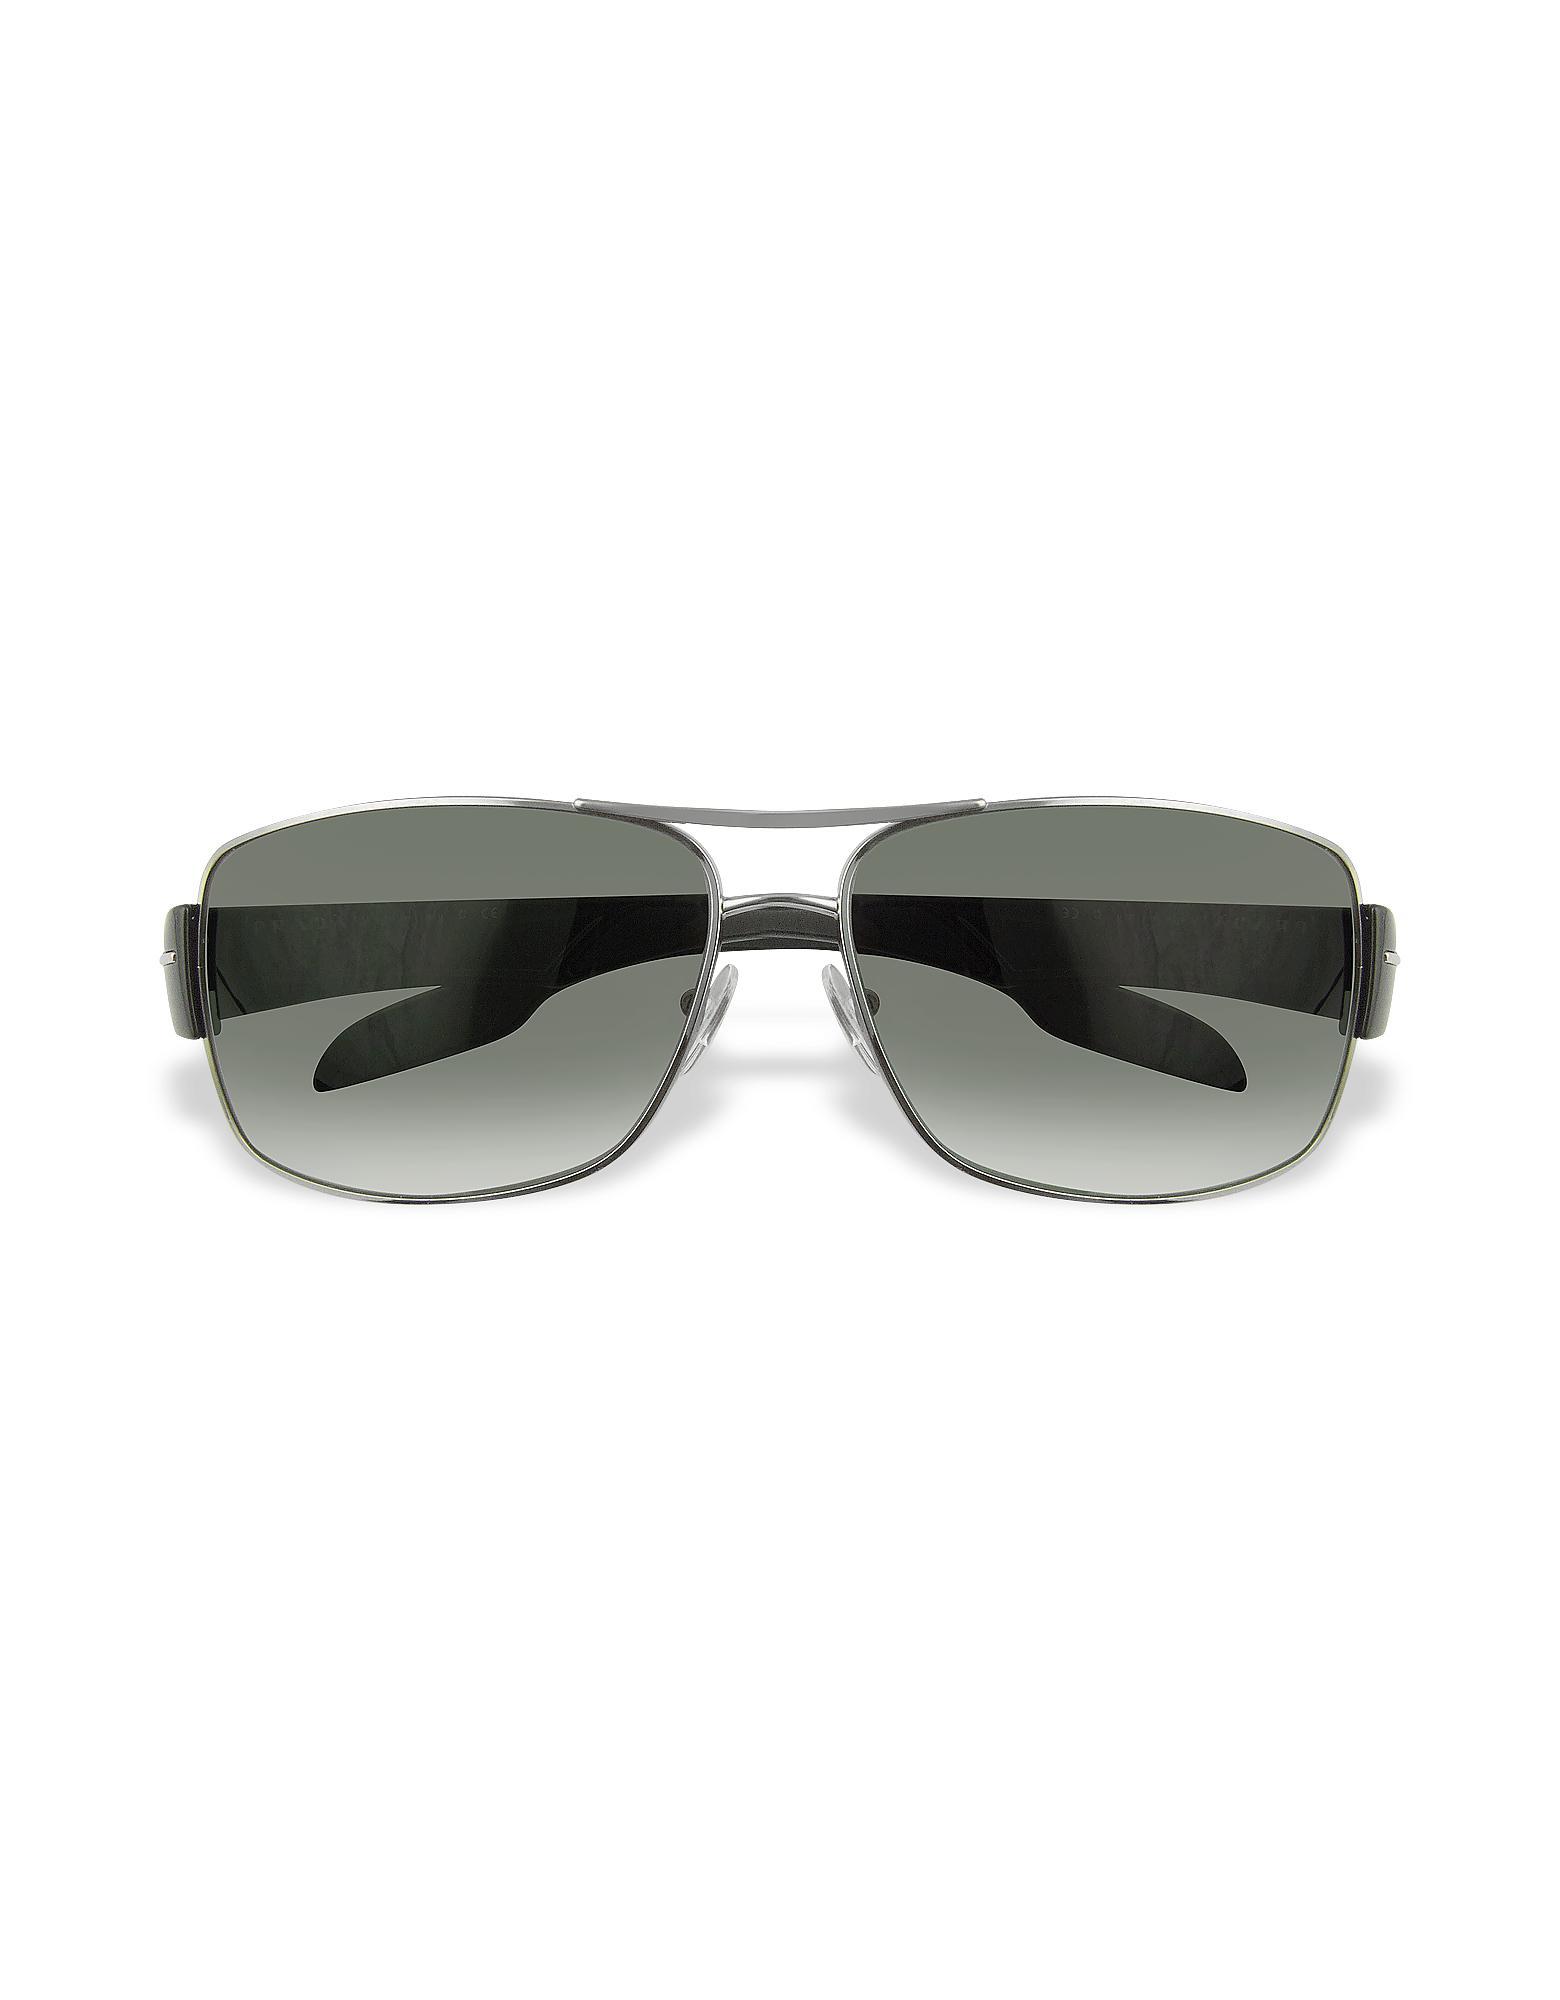 04daf7b397e ... promo code prada rectangle metal frame sunglasses in gray for men lyst  c4b1d 5f4bc